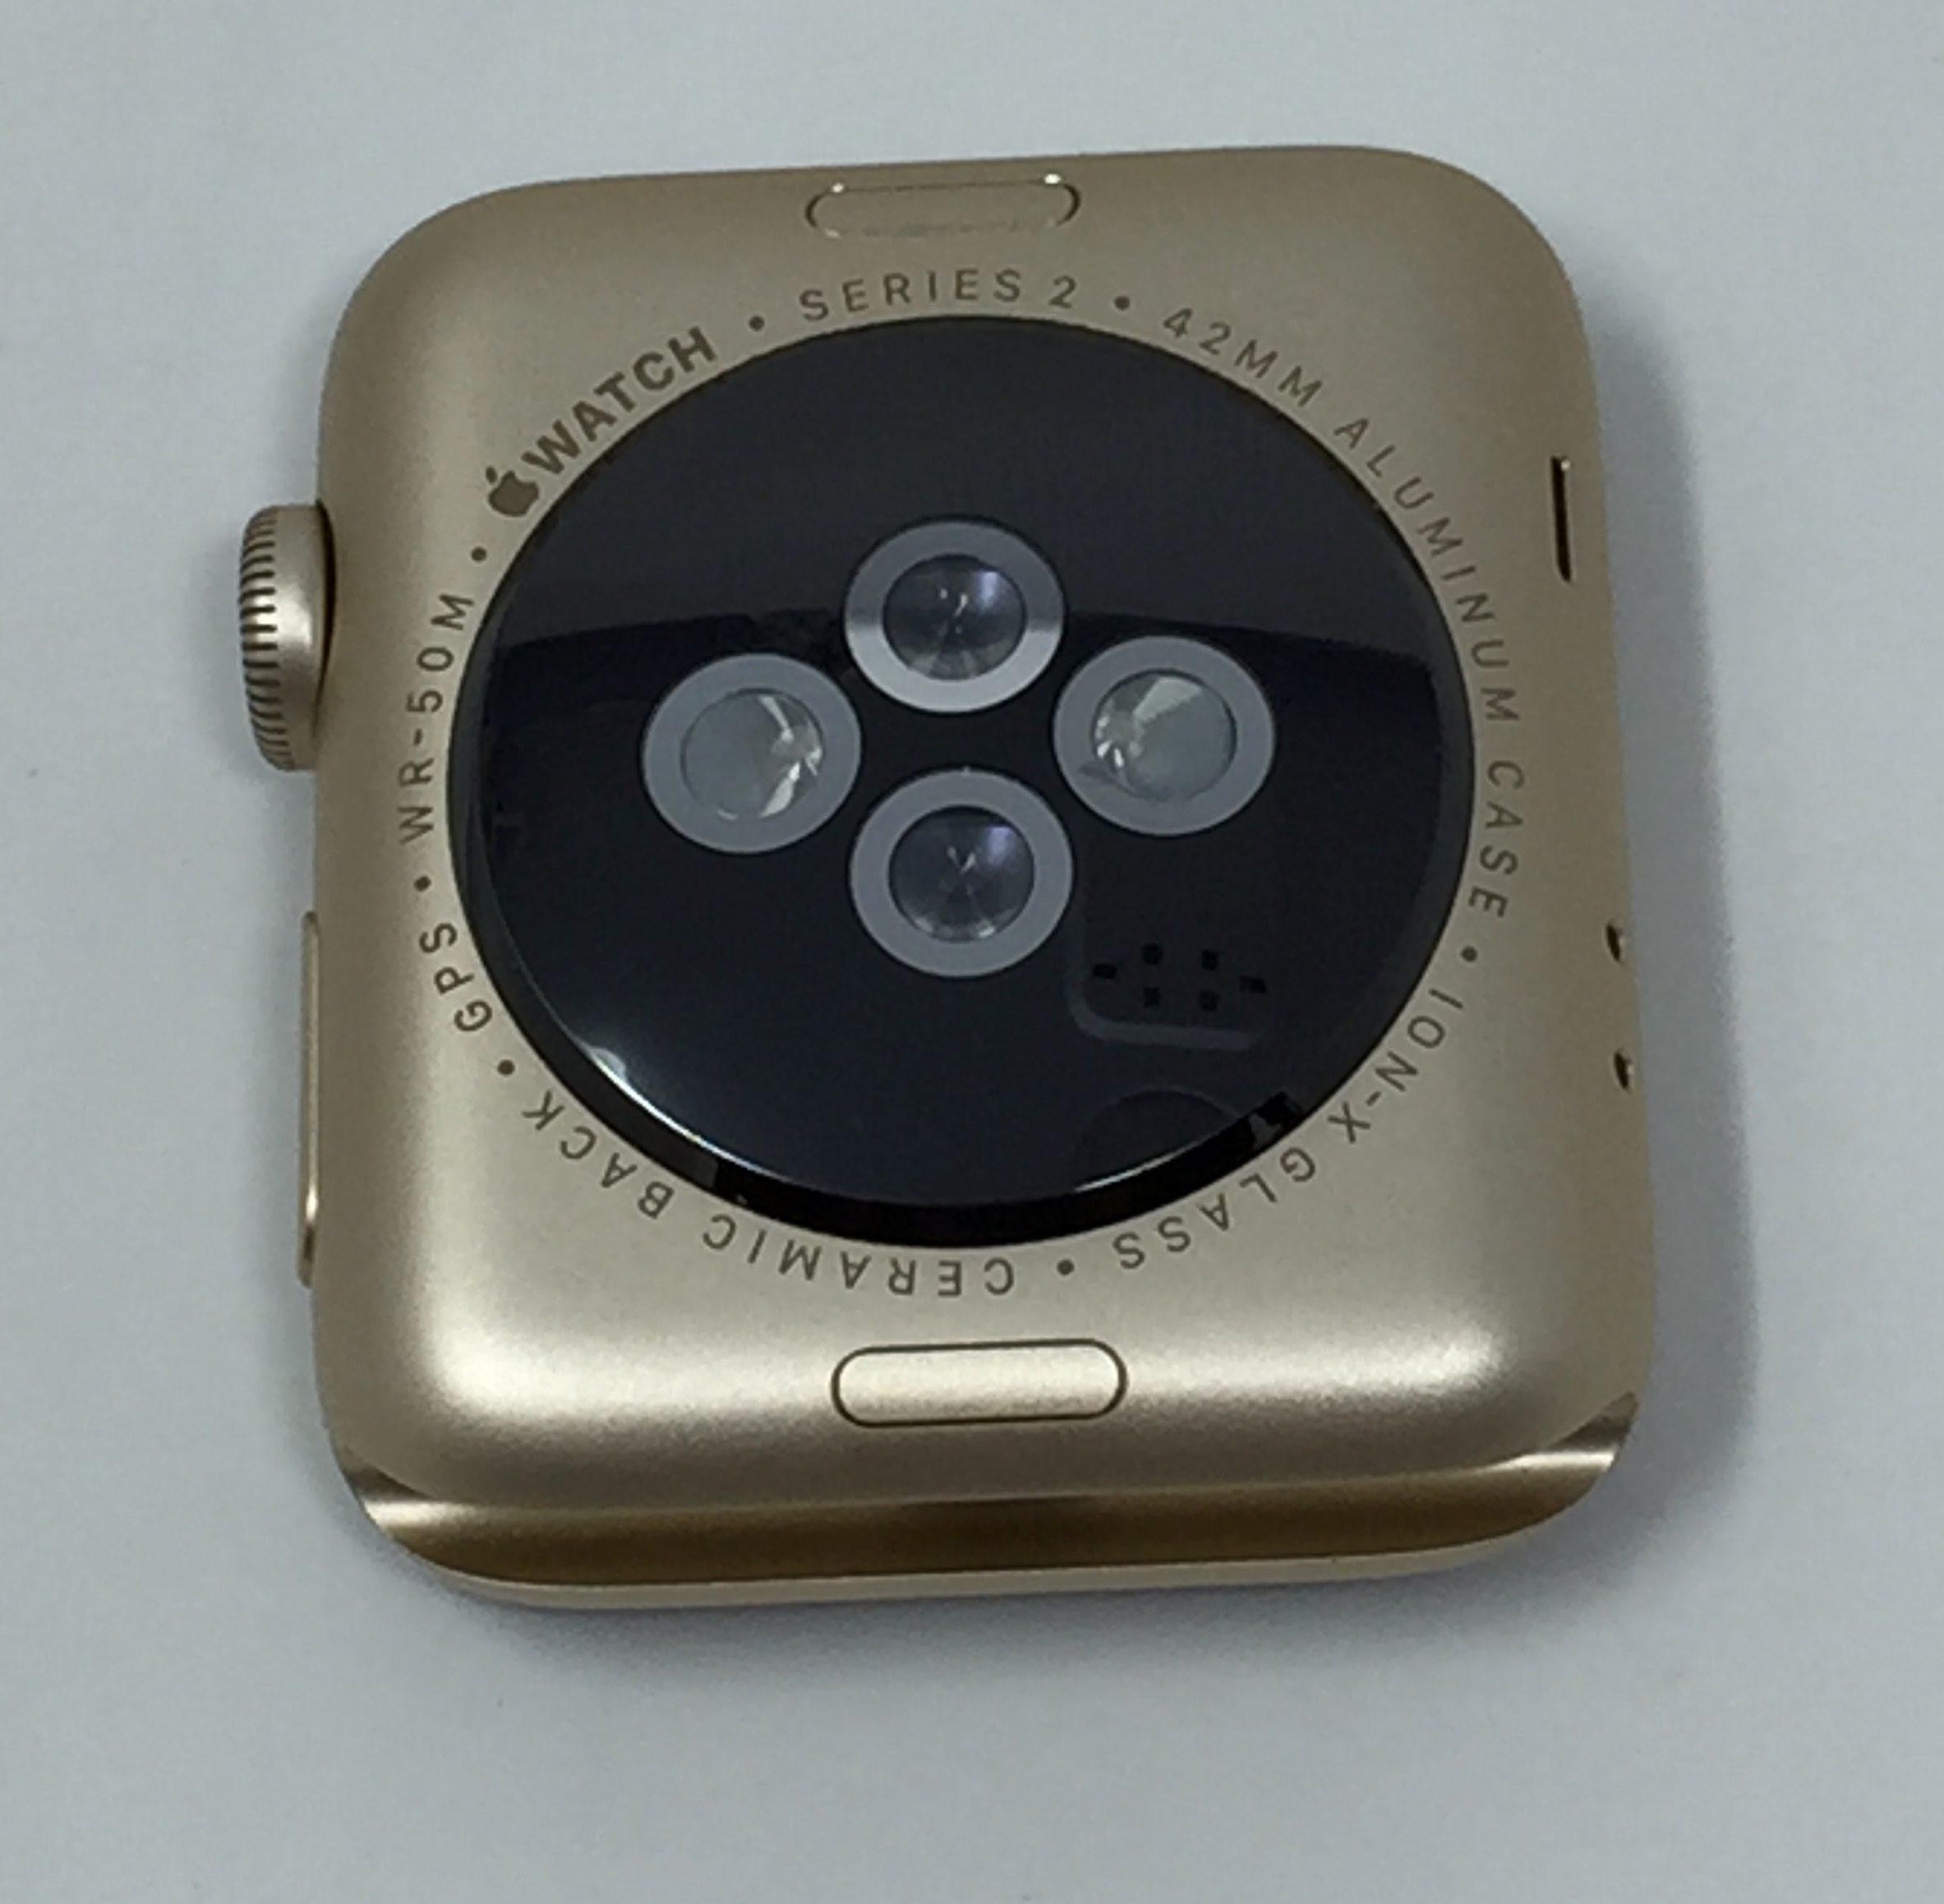 Watch Series 2 Aluminum (42mm), imagen 2